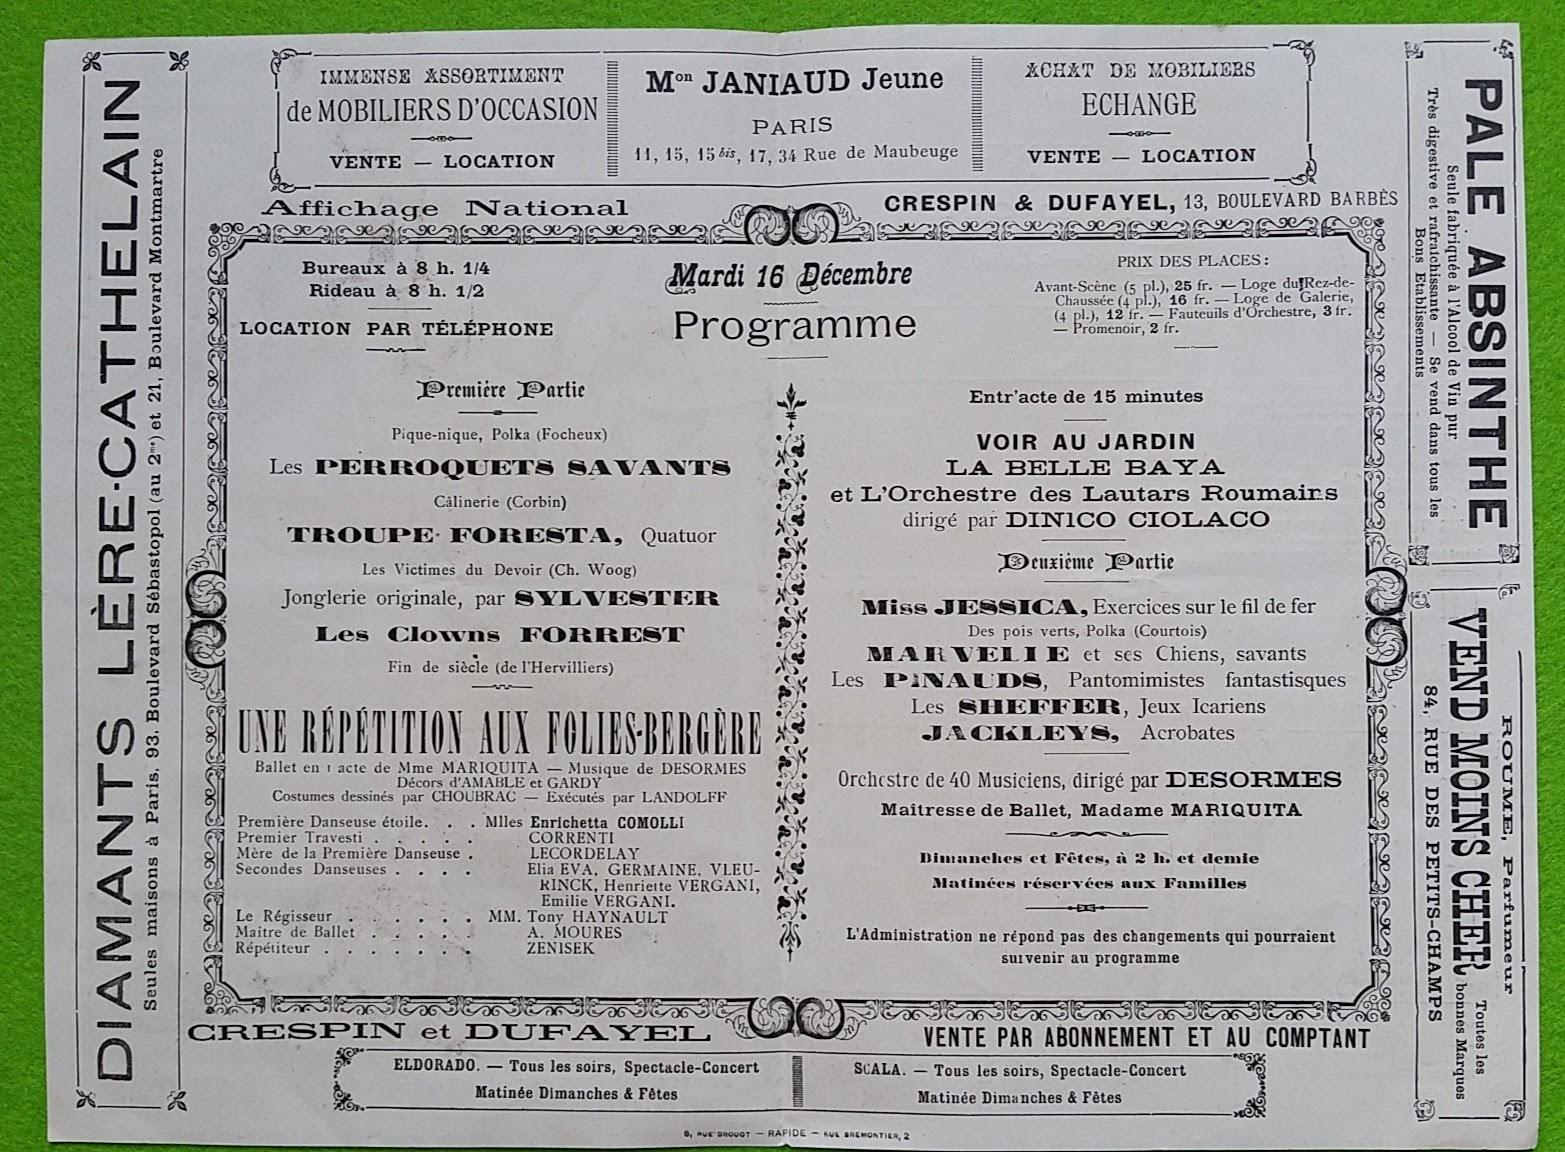 Folies Bergere in Paris - Programm vom 16. Dezember 1890